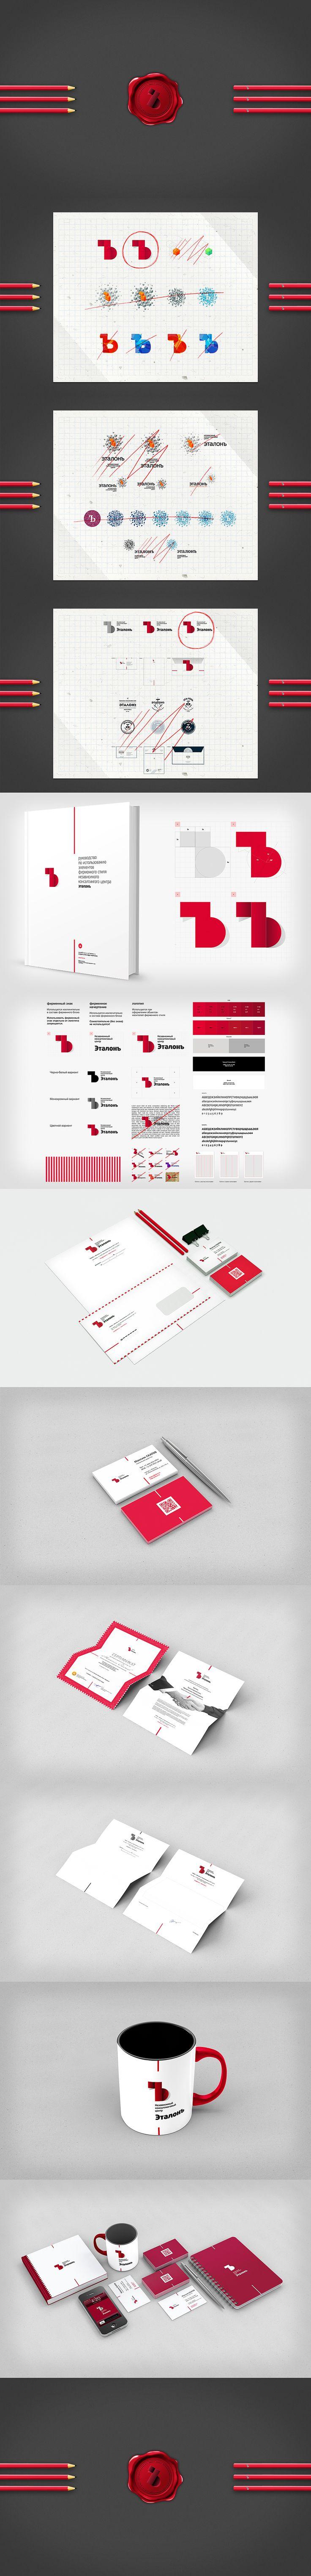 Branding for Independent Consulting Center «Эталонъ» #identity #logo #logotype #brand #branding #brandbook